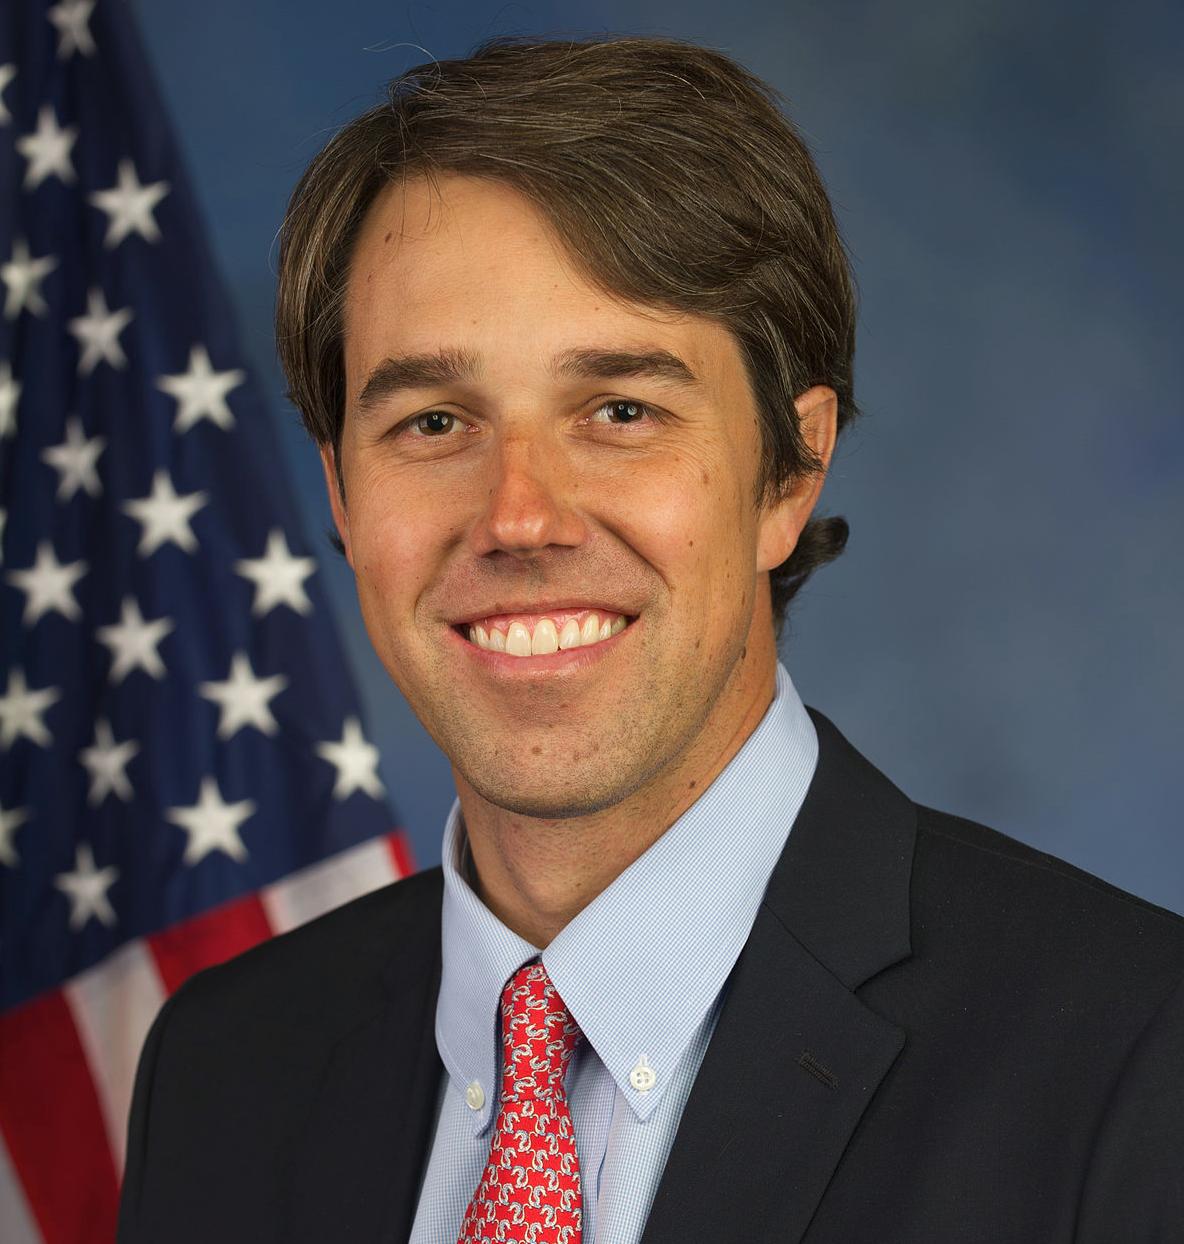 Beto O'Rourke  Photo by U.S. House of Representatives